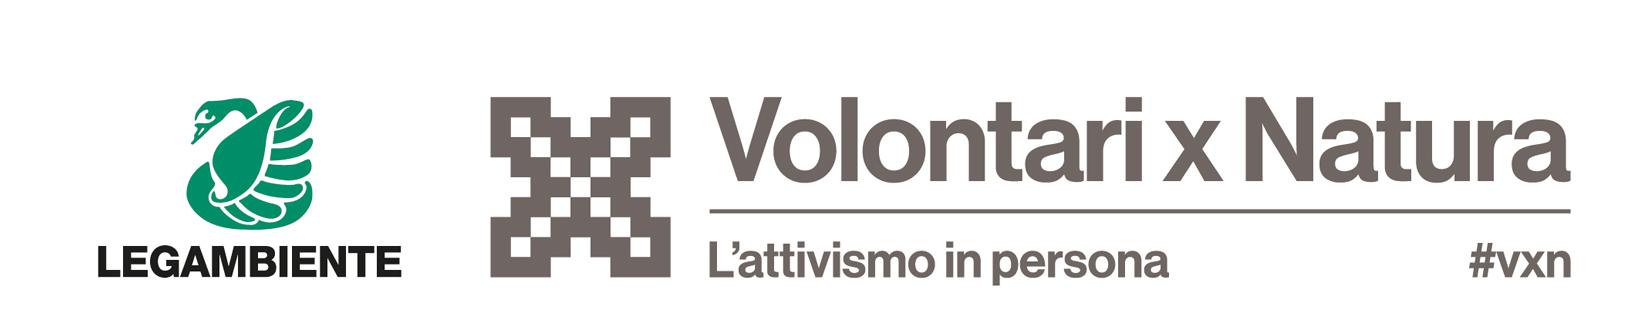 Logo-VXN-+-Legambiente_web